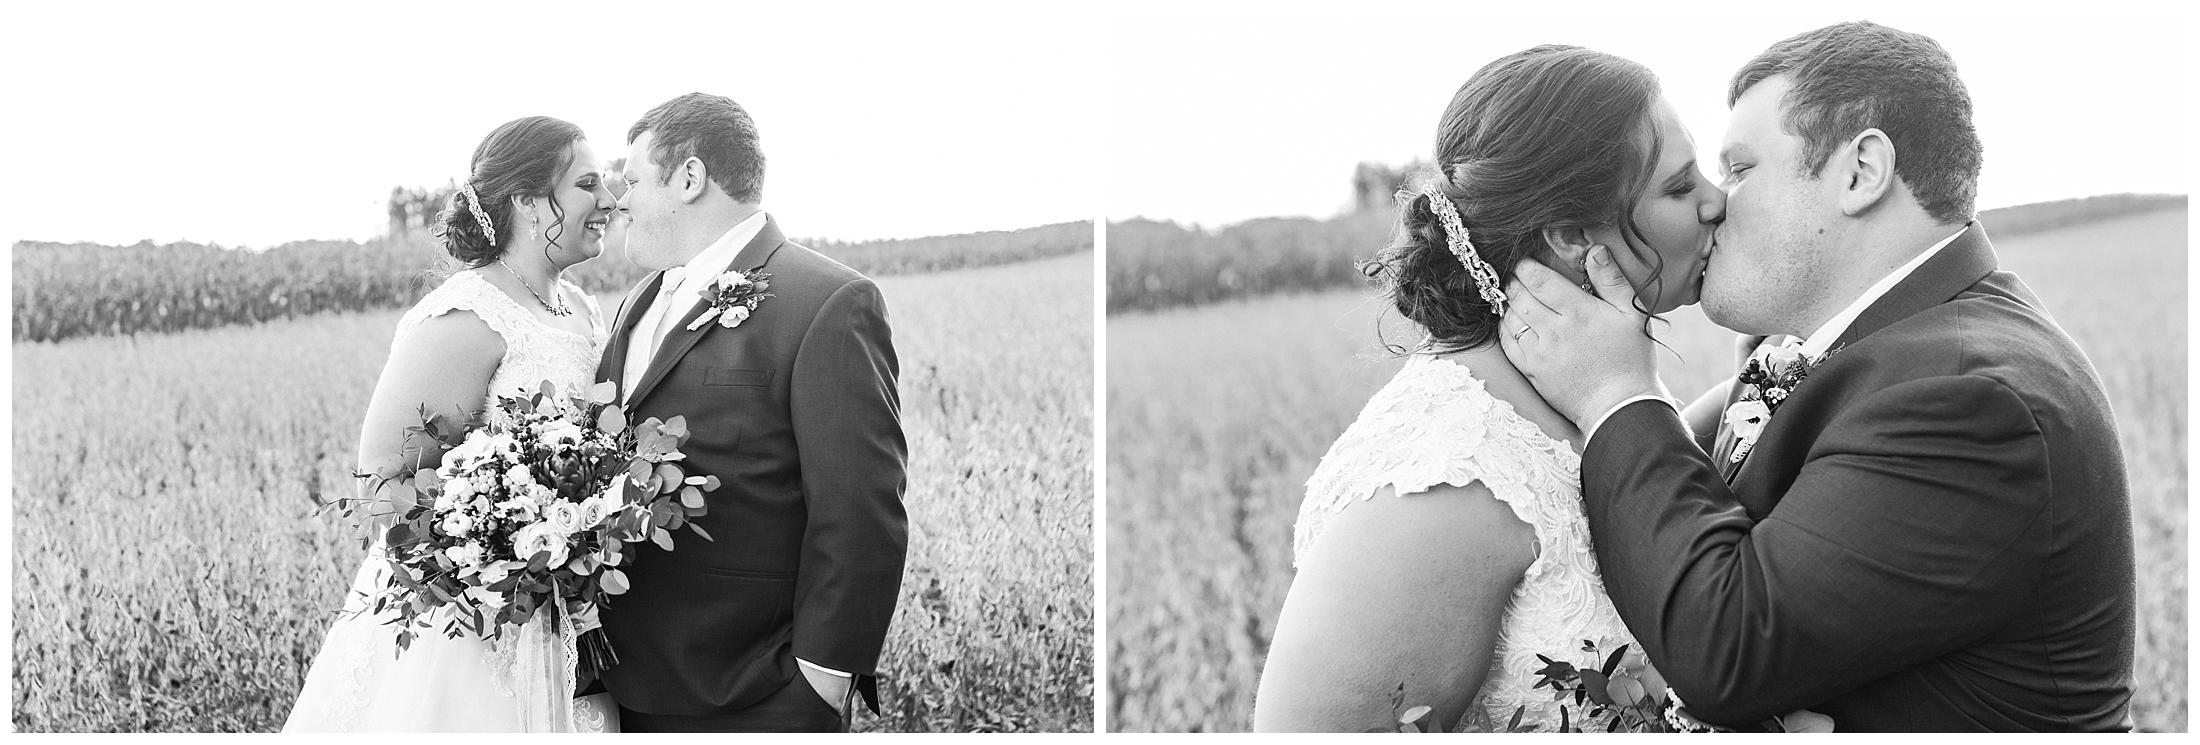 Pine-Ridge-Farm-Wedding_0049.jpg